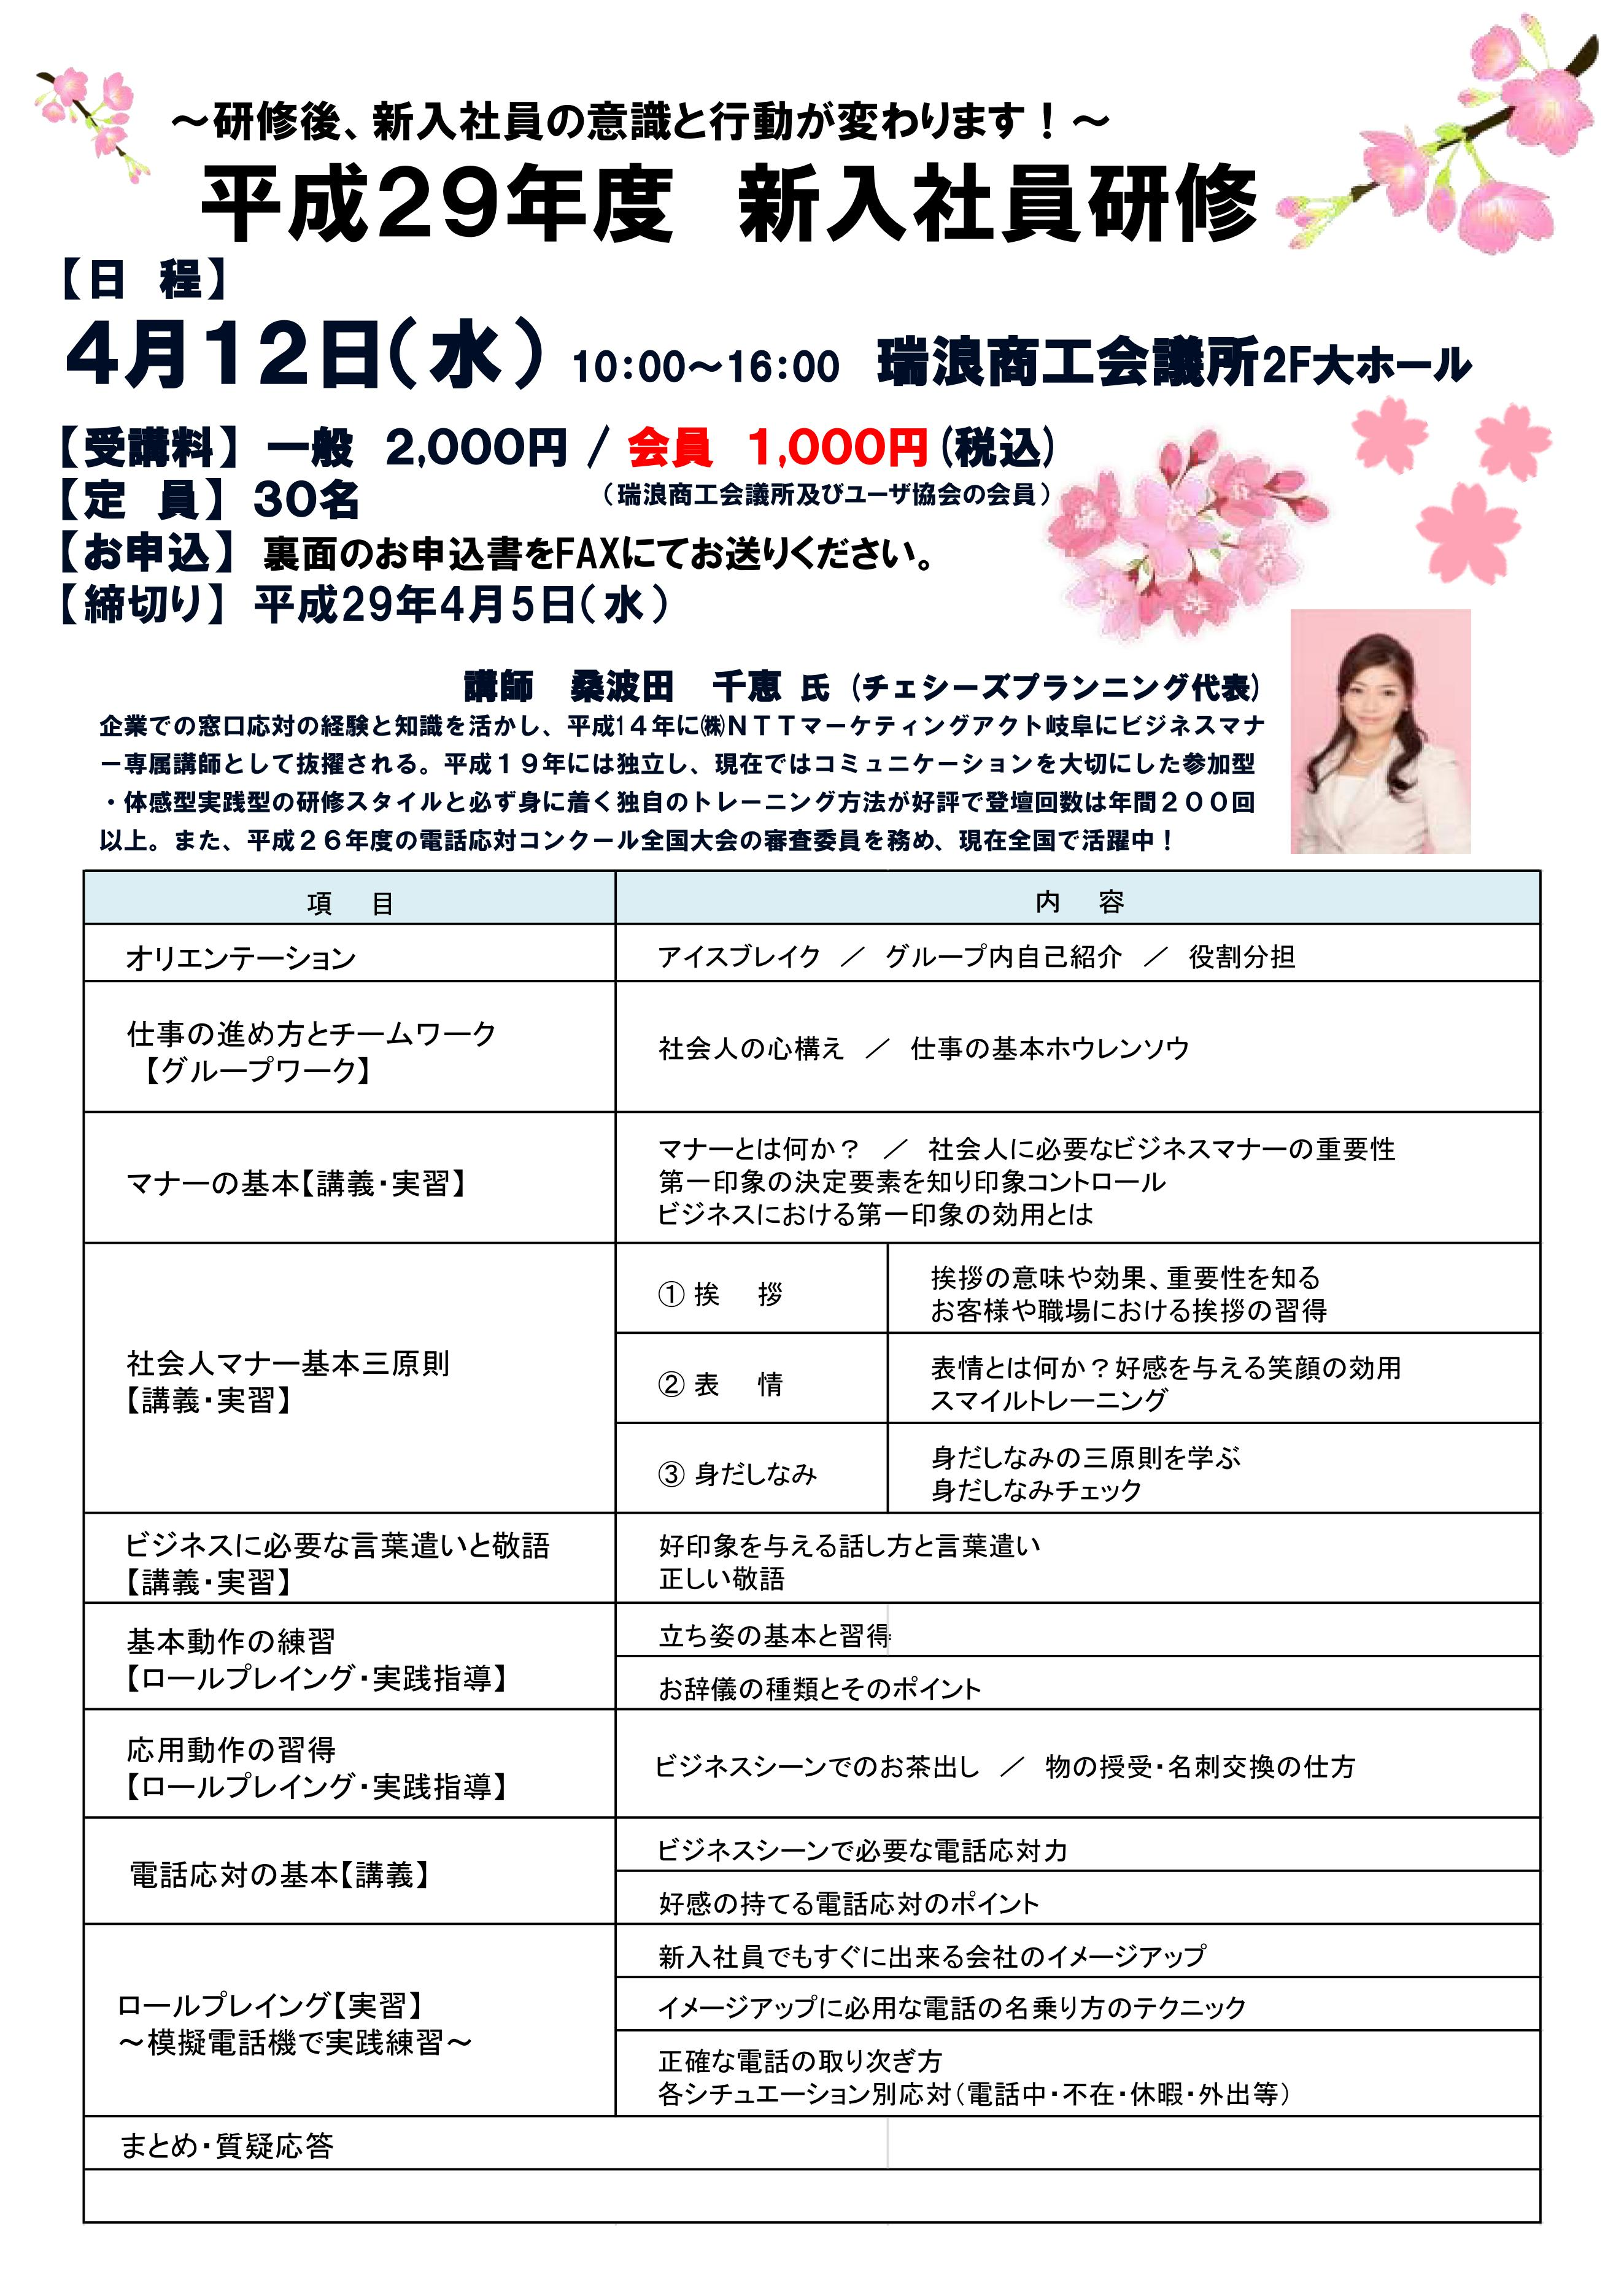 【セミナー】平成29年度 新入社員研修